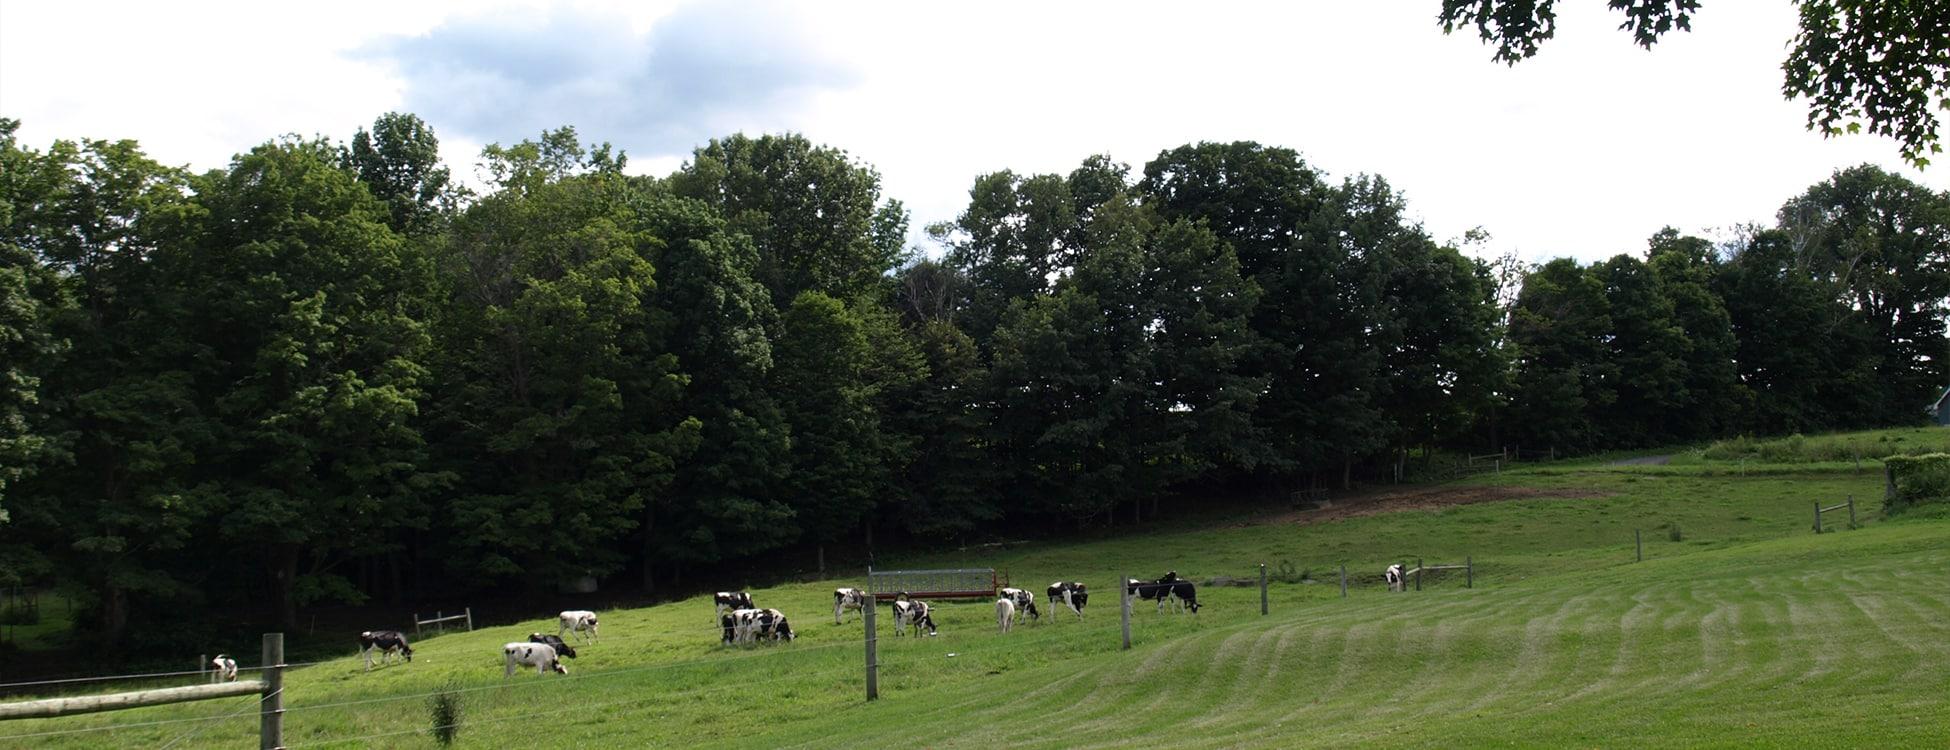 Vermont agriculture, cows, Randolph Center campus